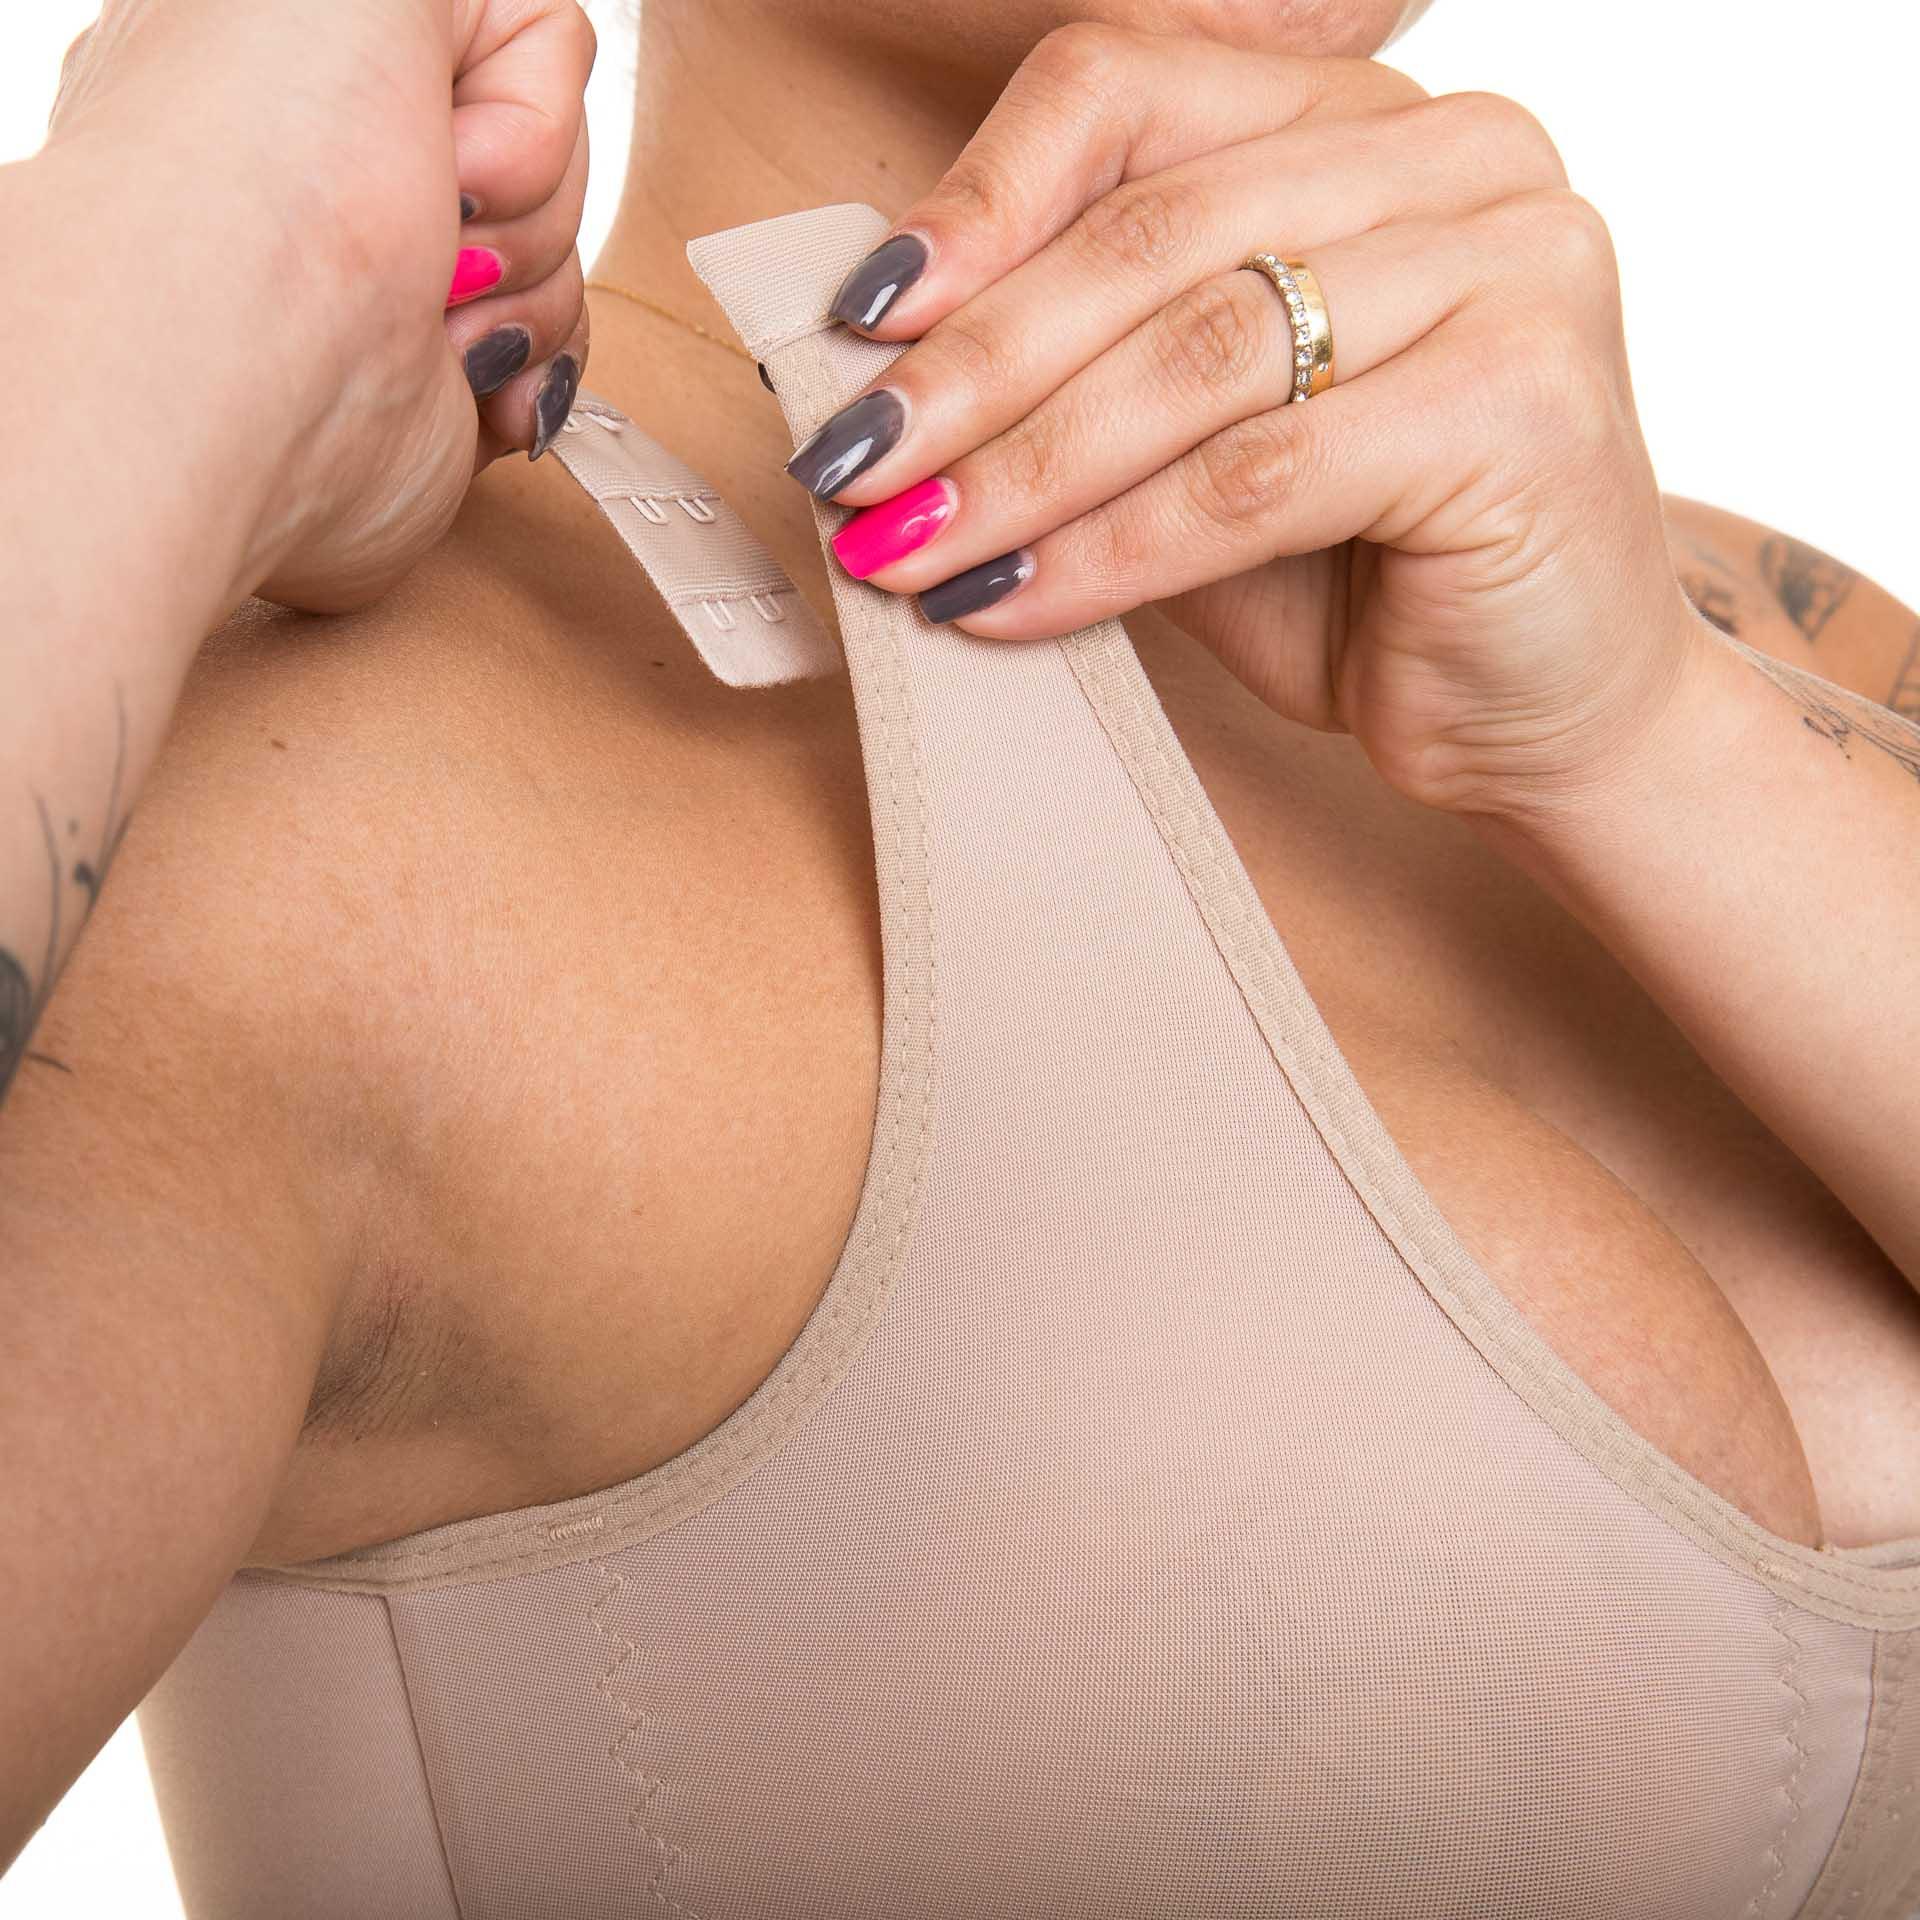 Sutiã Anatômico Reabilit 4017 abertura frontal, alça c colchetes, tecido cetinete pós cirúrgico p mastopexia mamoplastia  - Cinta se Nova